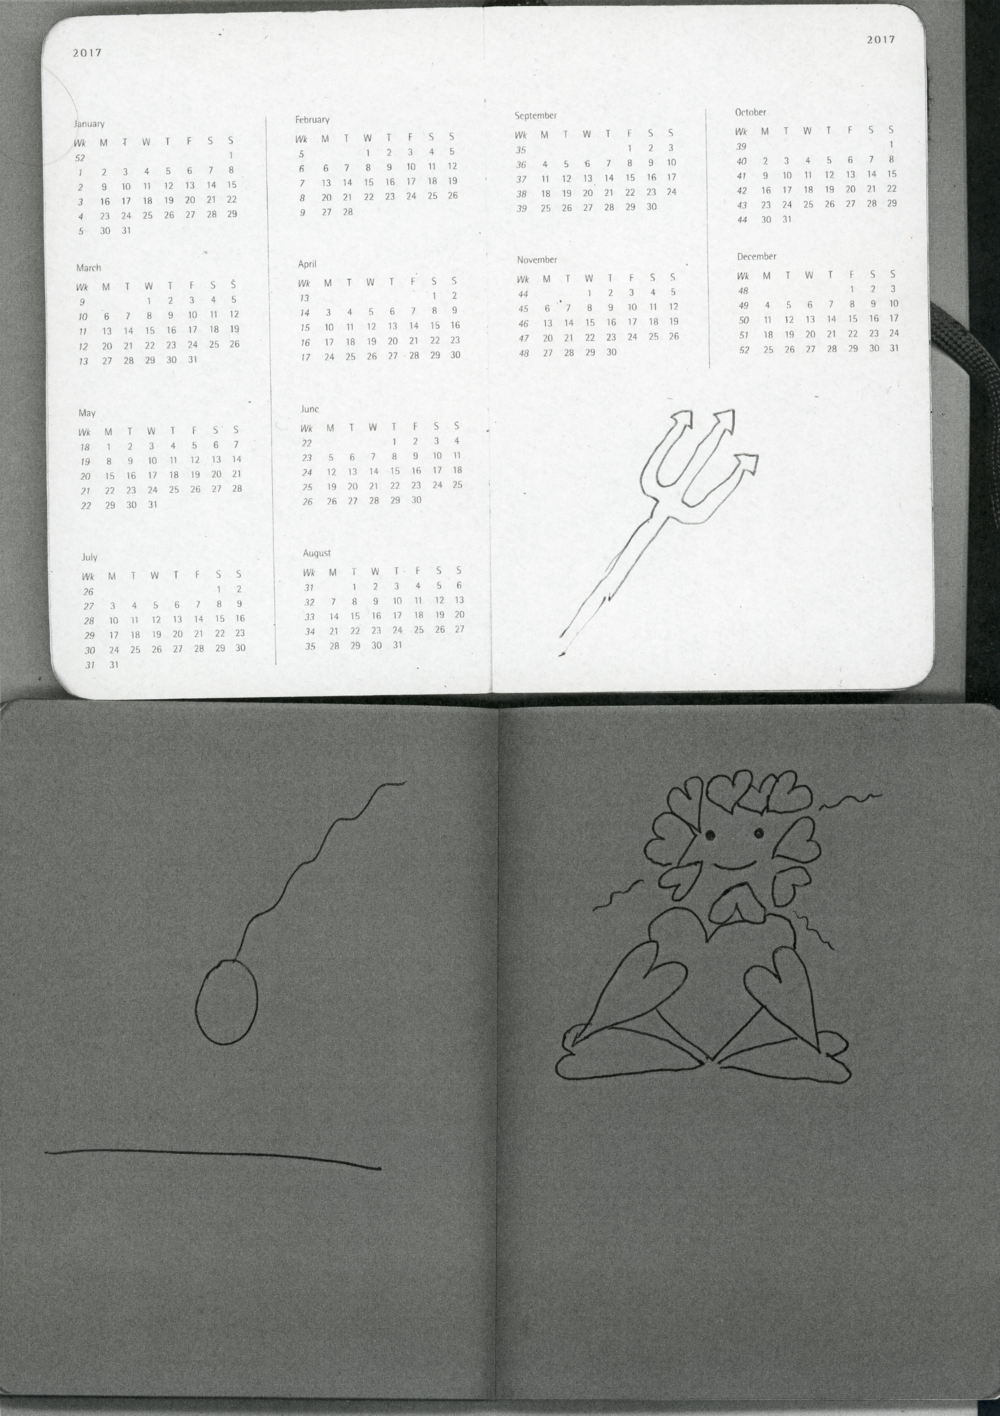 21.0 x 29.7 cm black and white print  2018 Agenda & Coloured Booklet